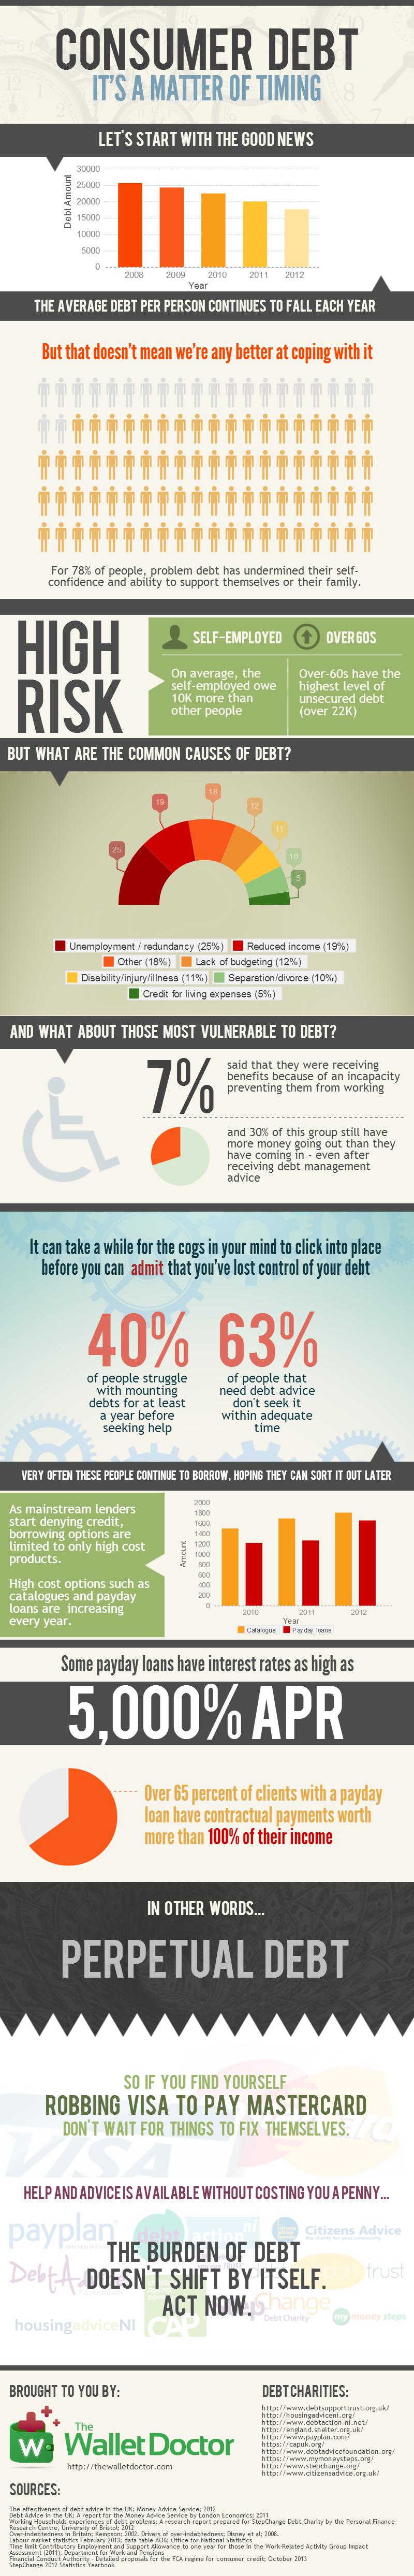 Consumer-Debt-Infographic